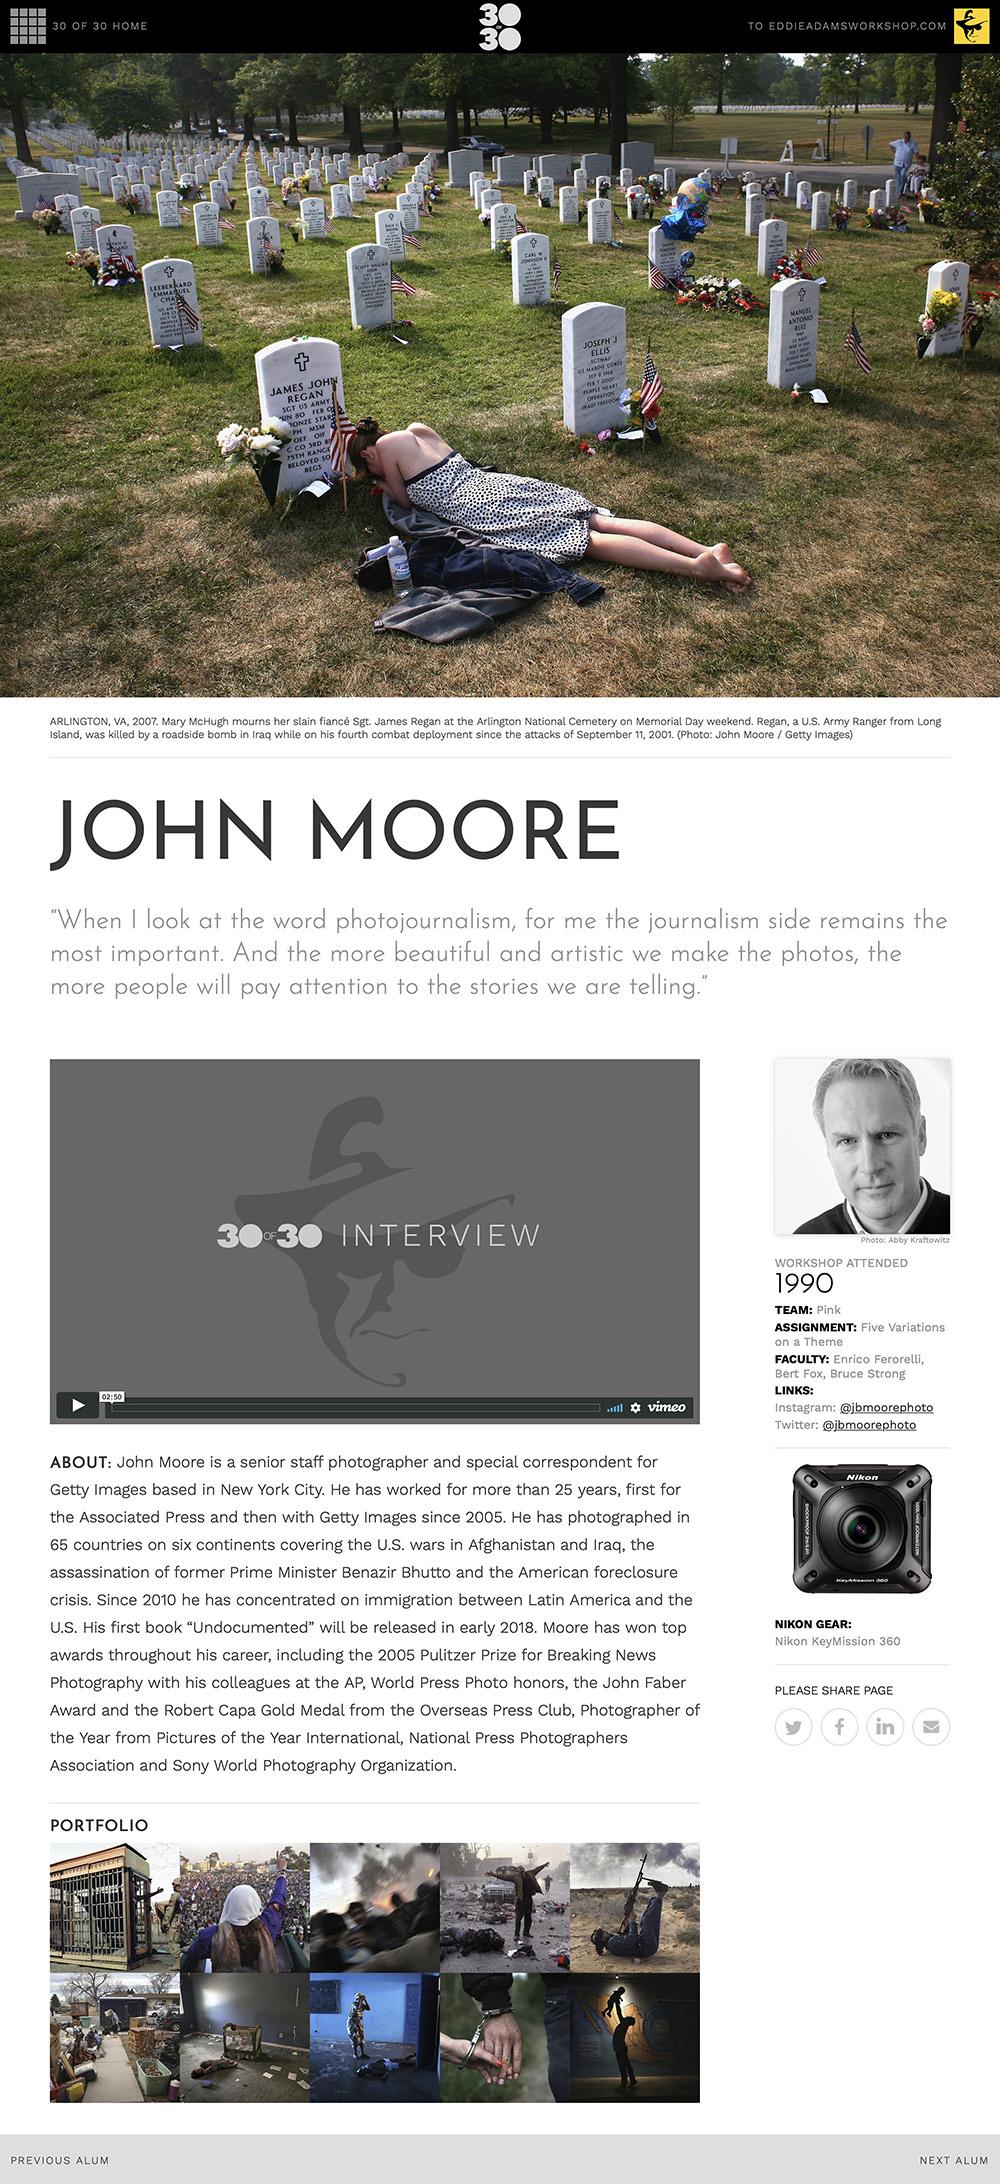 30of30_John-Moore_1000.jpg